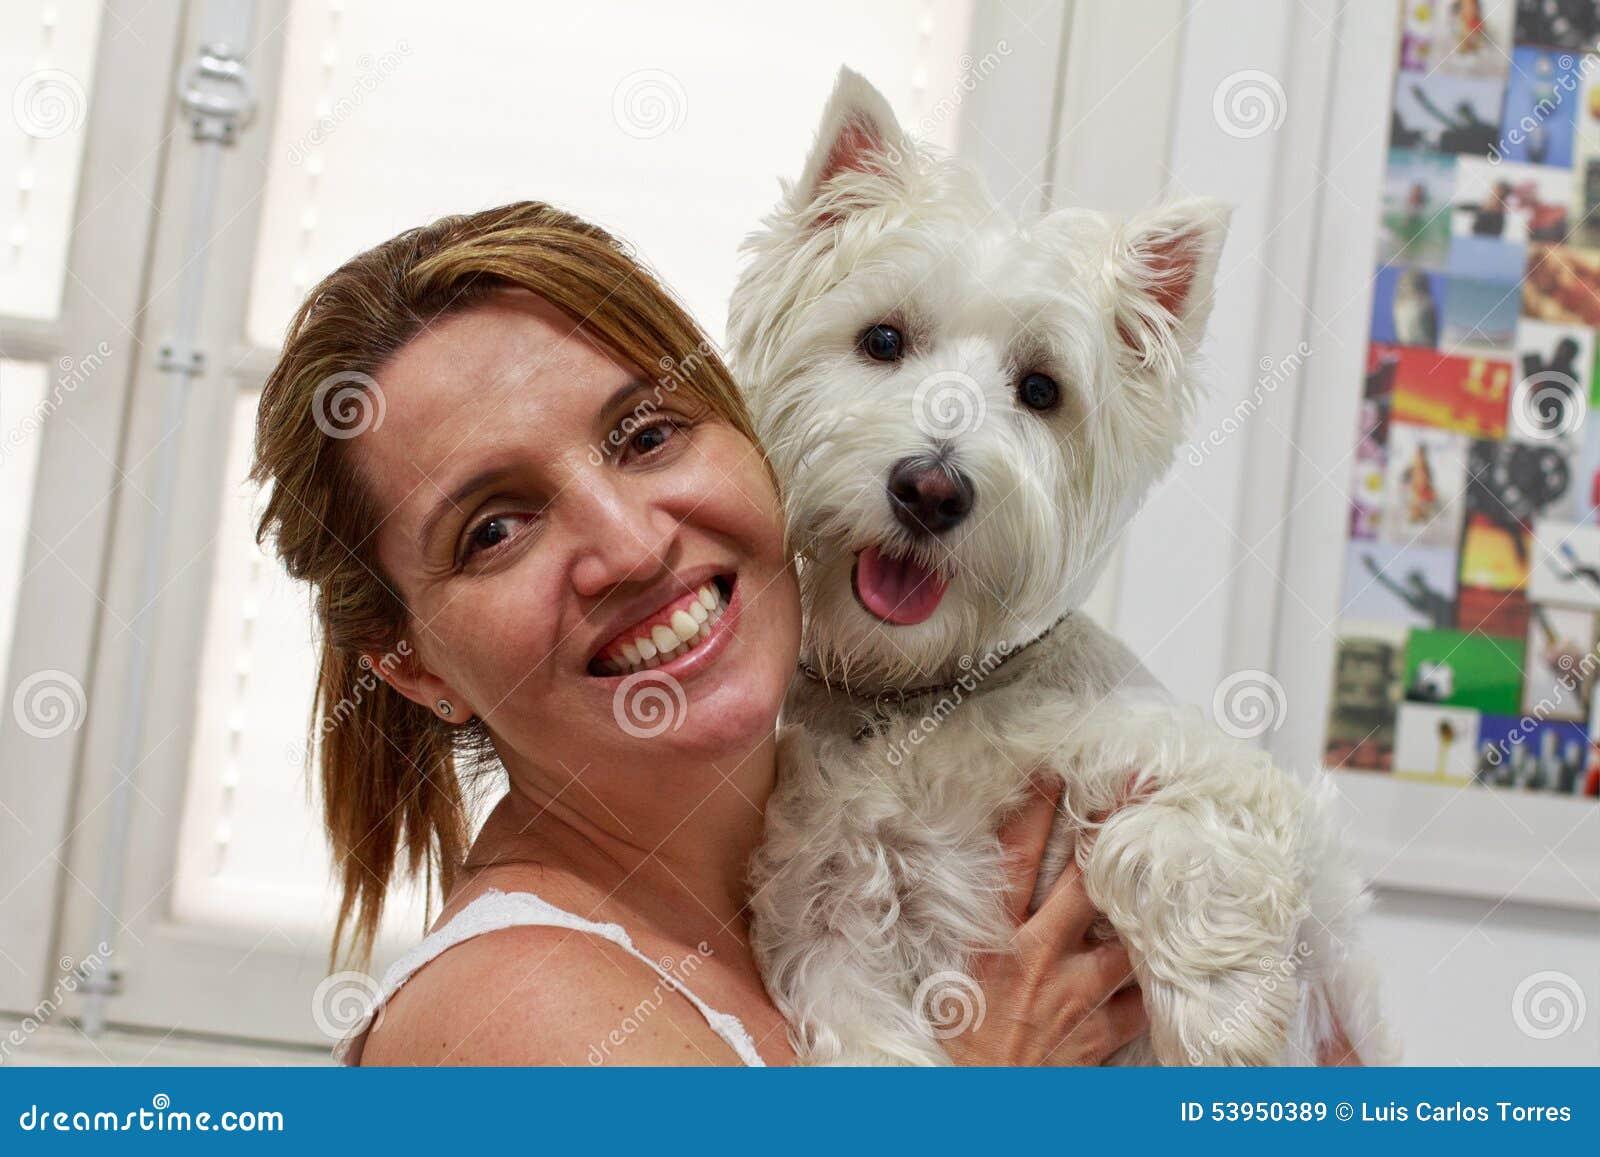 Brazilian woman and her Westie